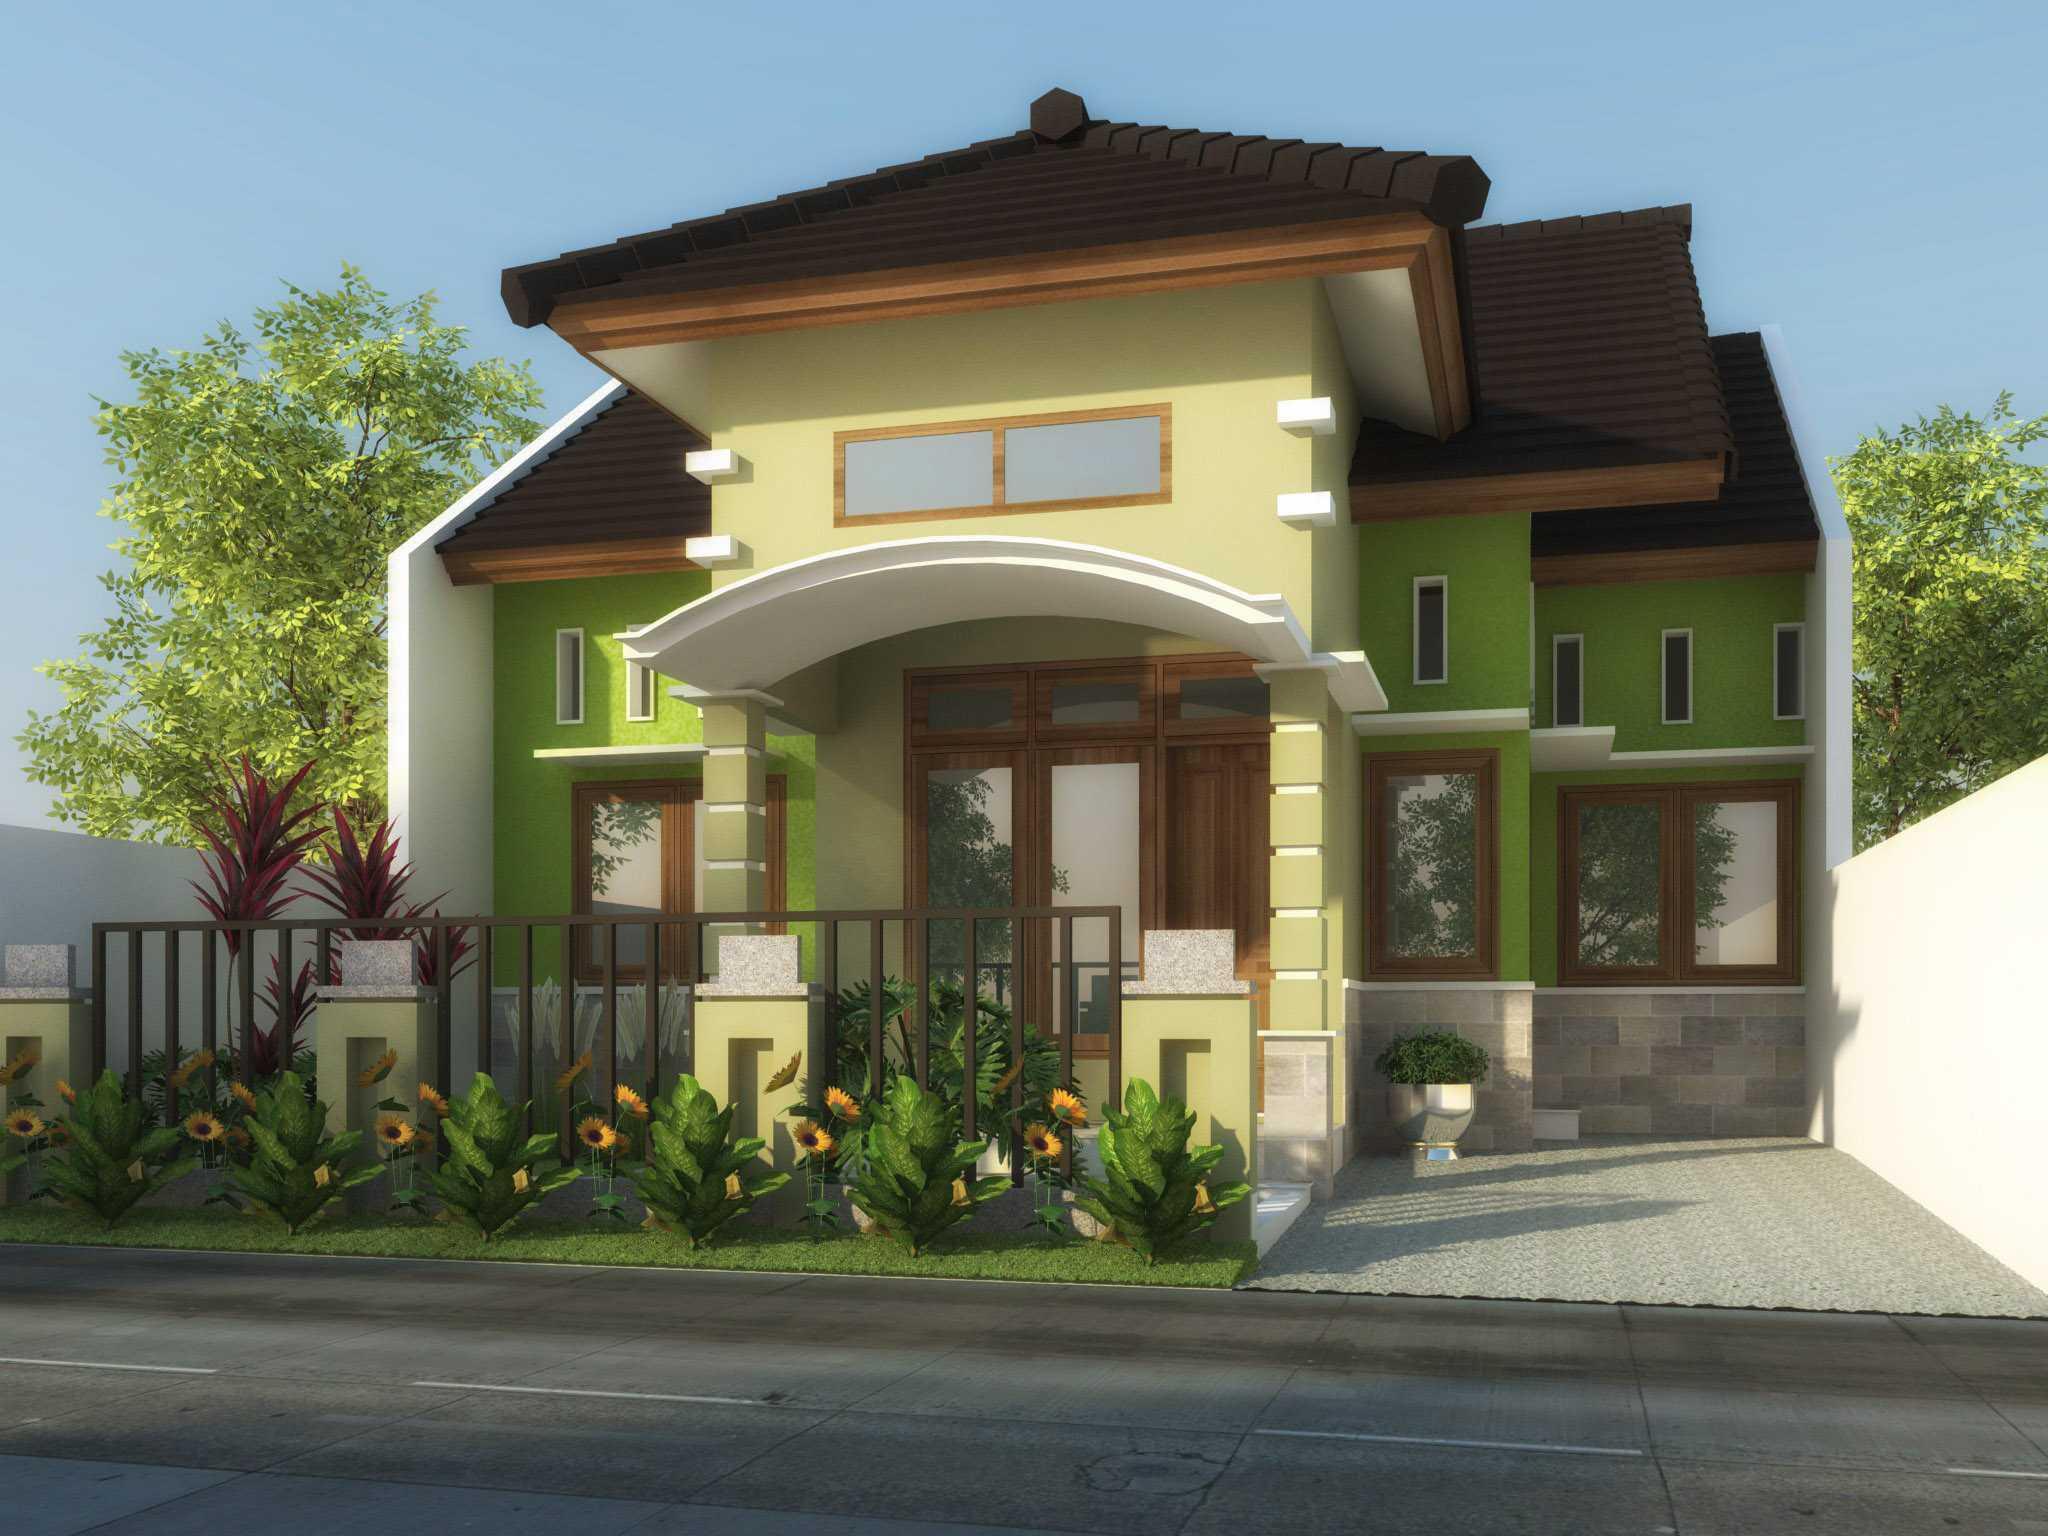 Wgstudioid Desain Rumah Wlingi Blitar Wlingi, Blitar, Jawa Timur, Indonesia Wlingi, Blitar, Jawa Timur, Indonesia Wgstudioid-Desain-Rumah-Wlingi-Blitar  74942